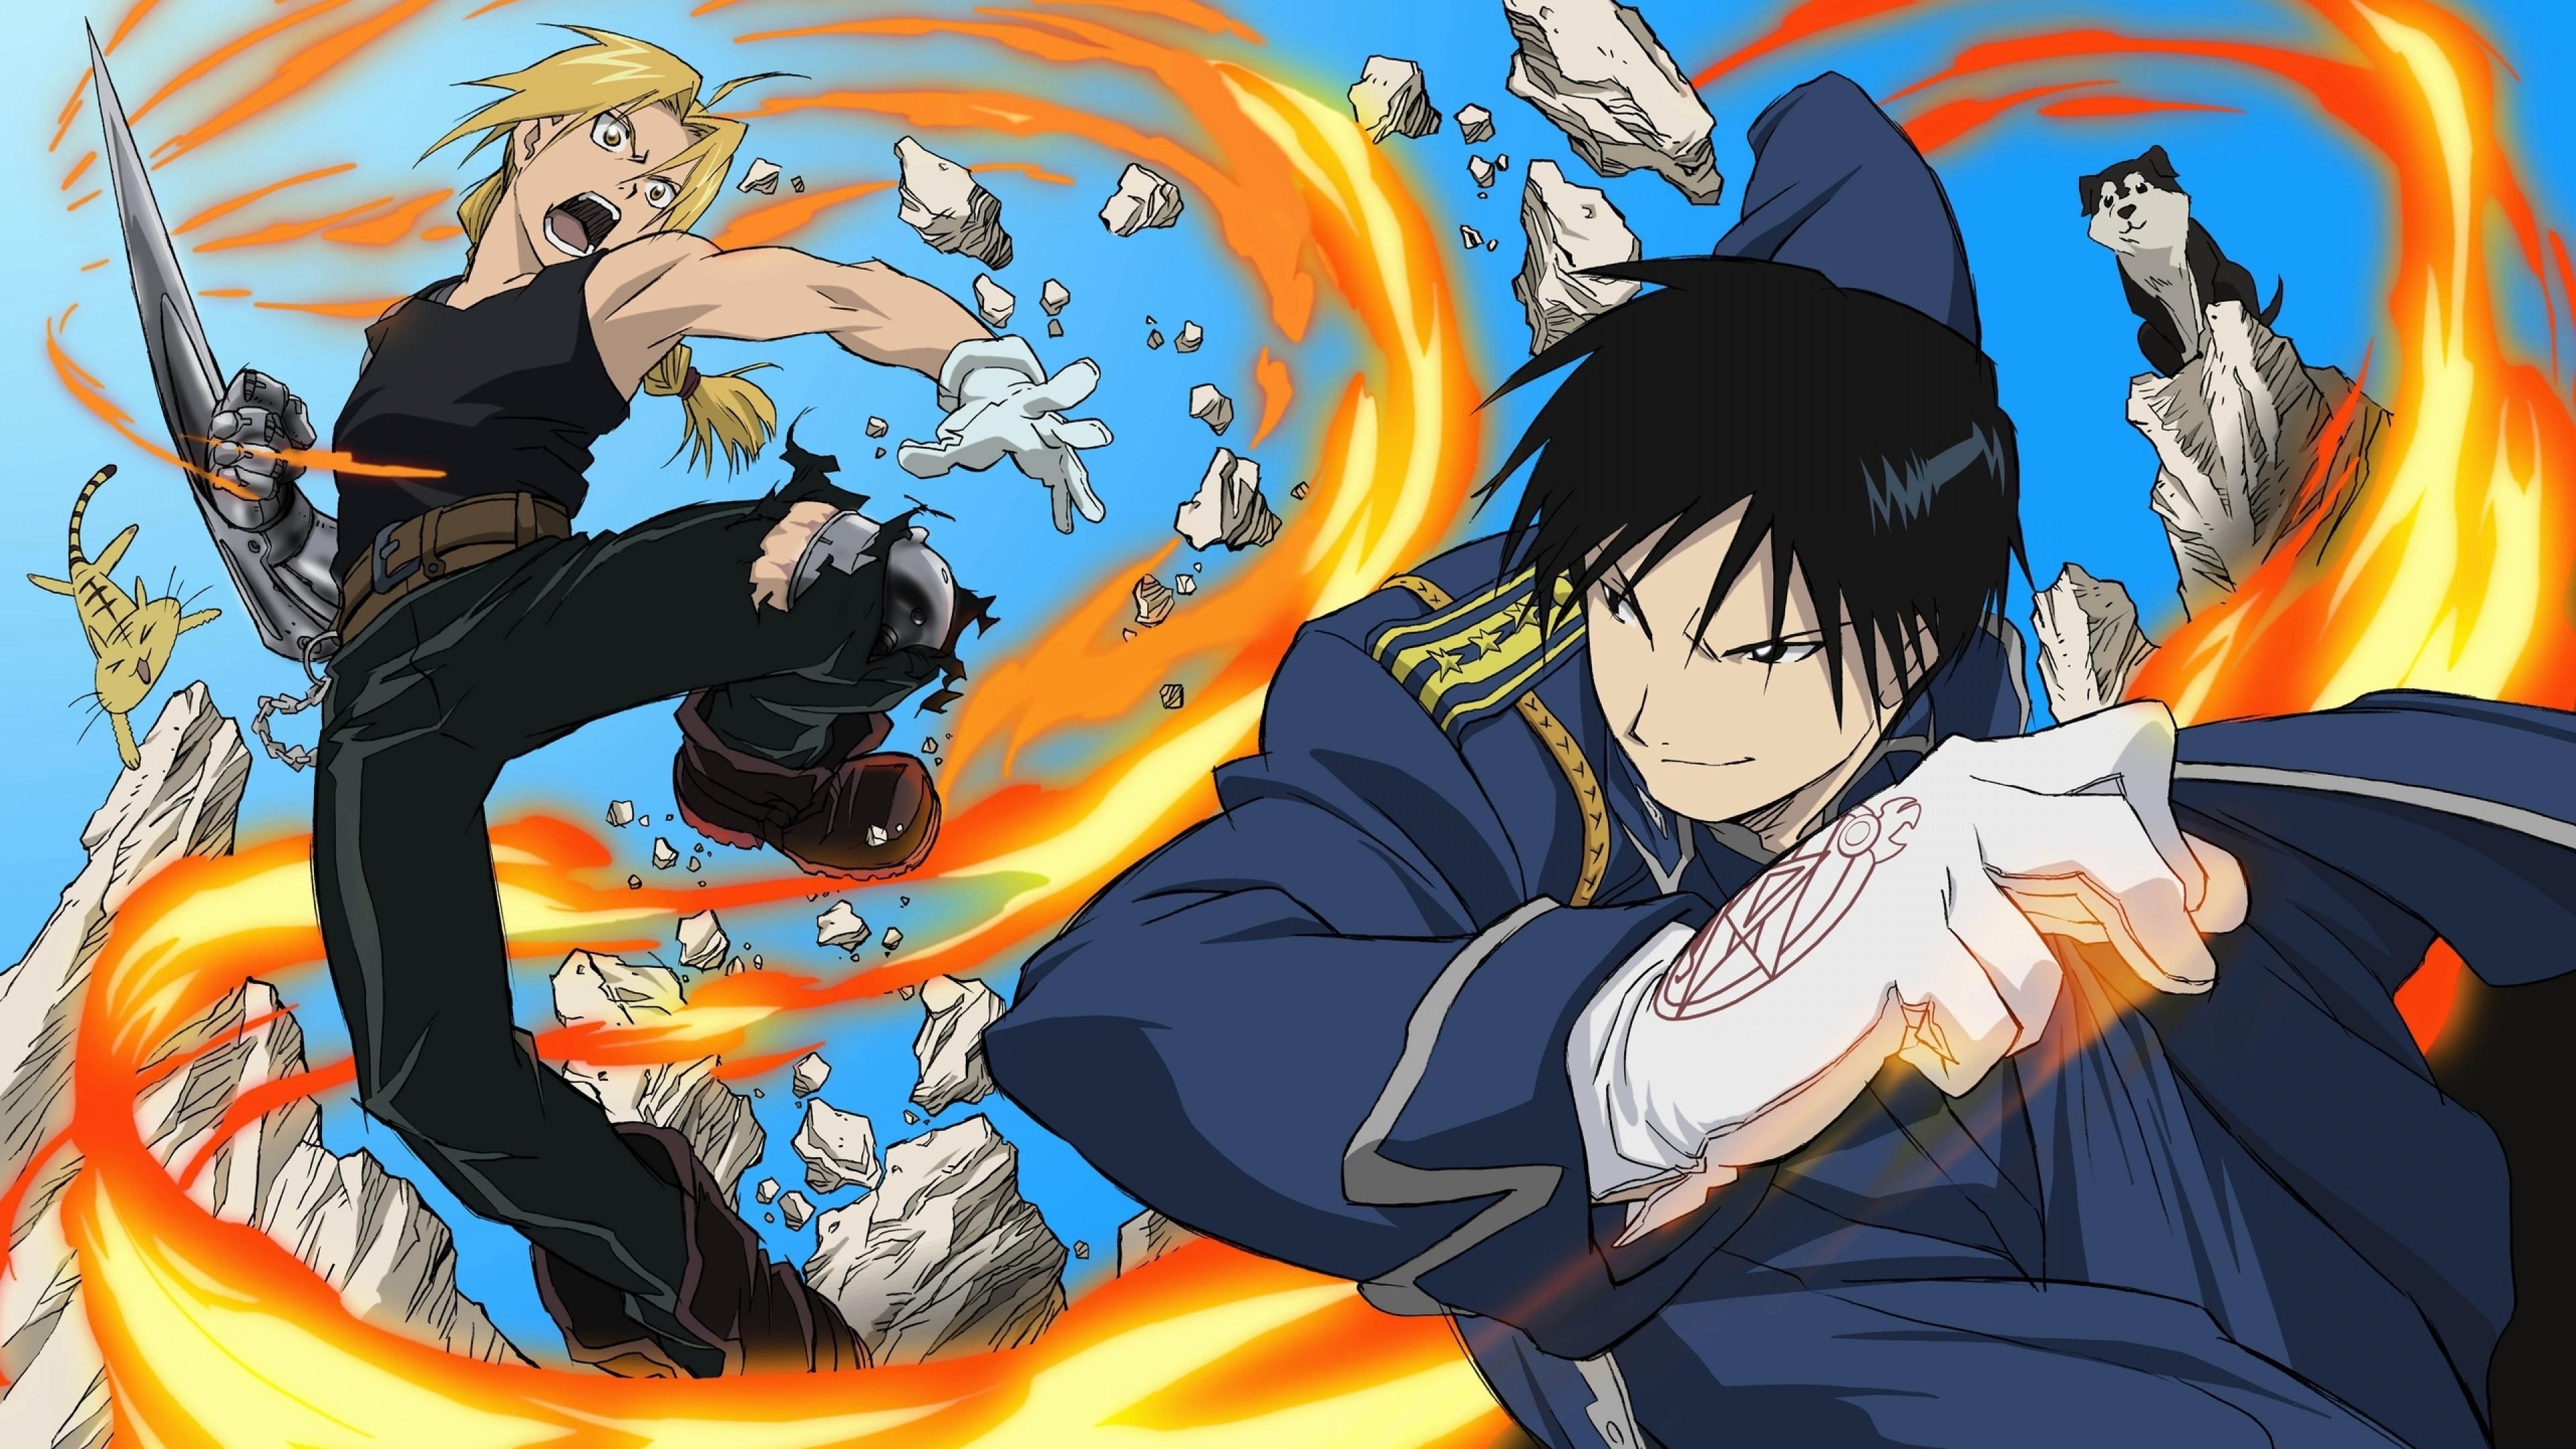 Wallpaper anime, boys, fight, fire, jump